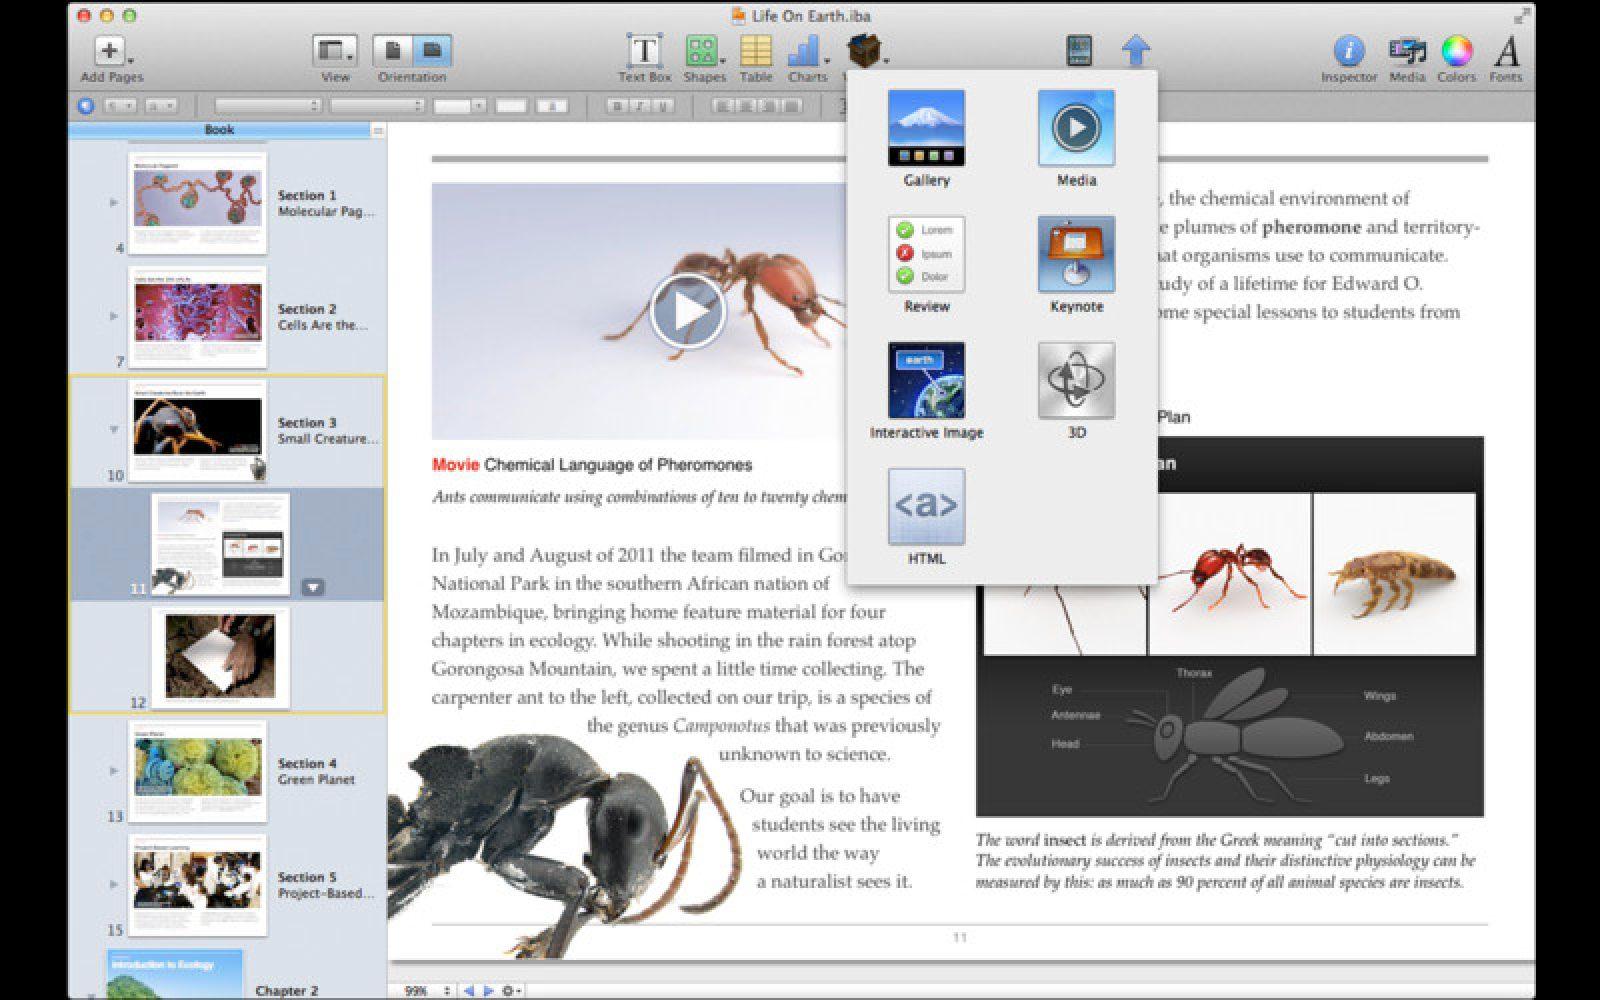 Apple announces iBooks Author, a free Mac app for authoring